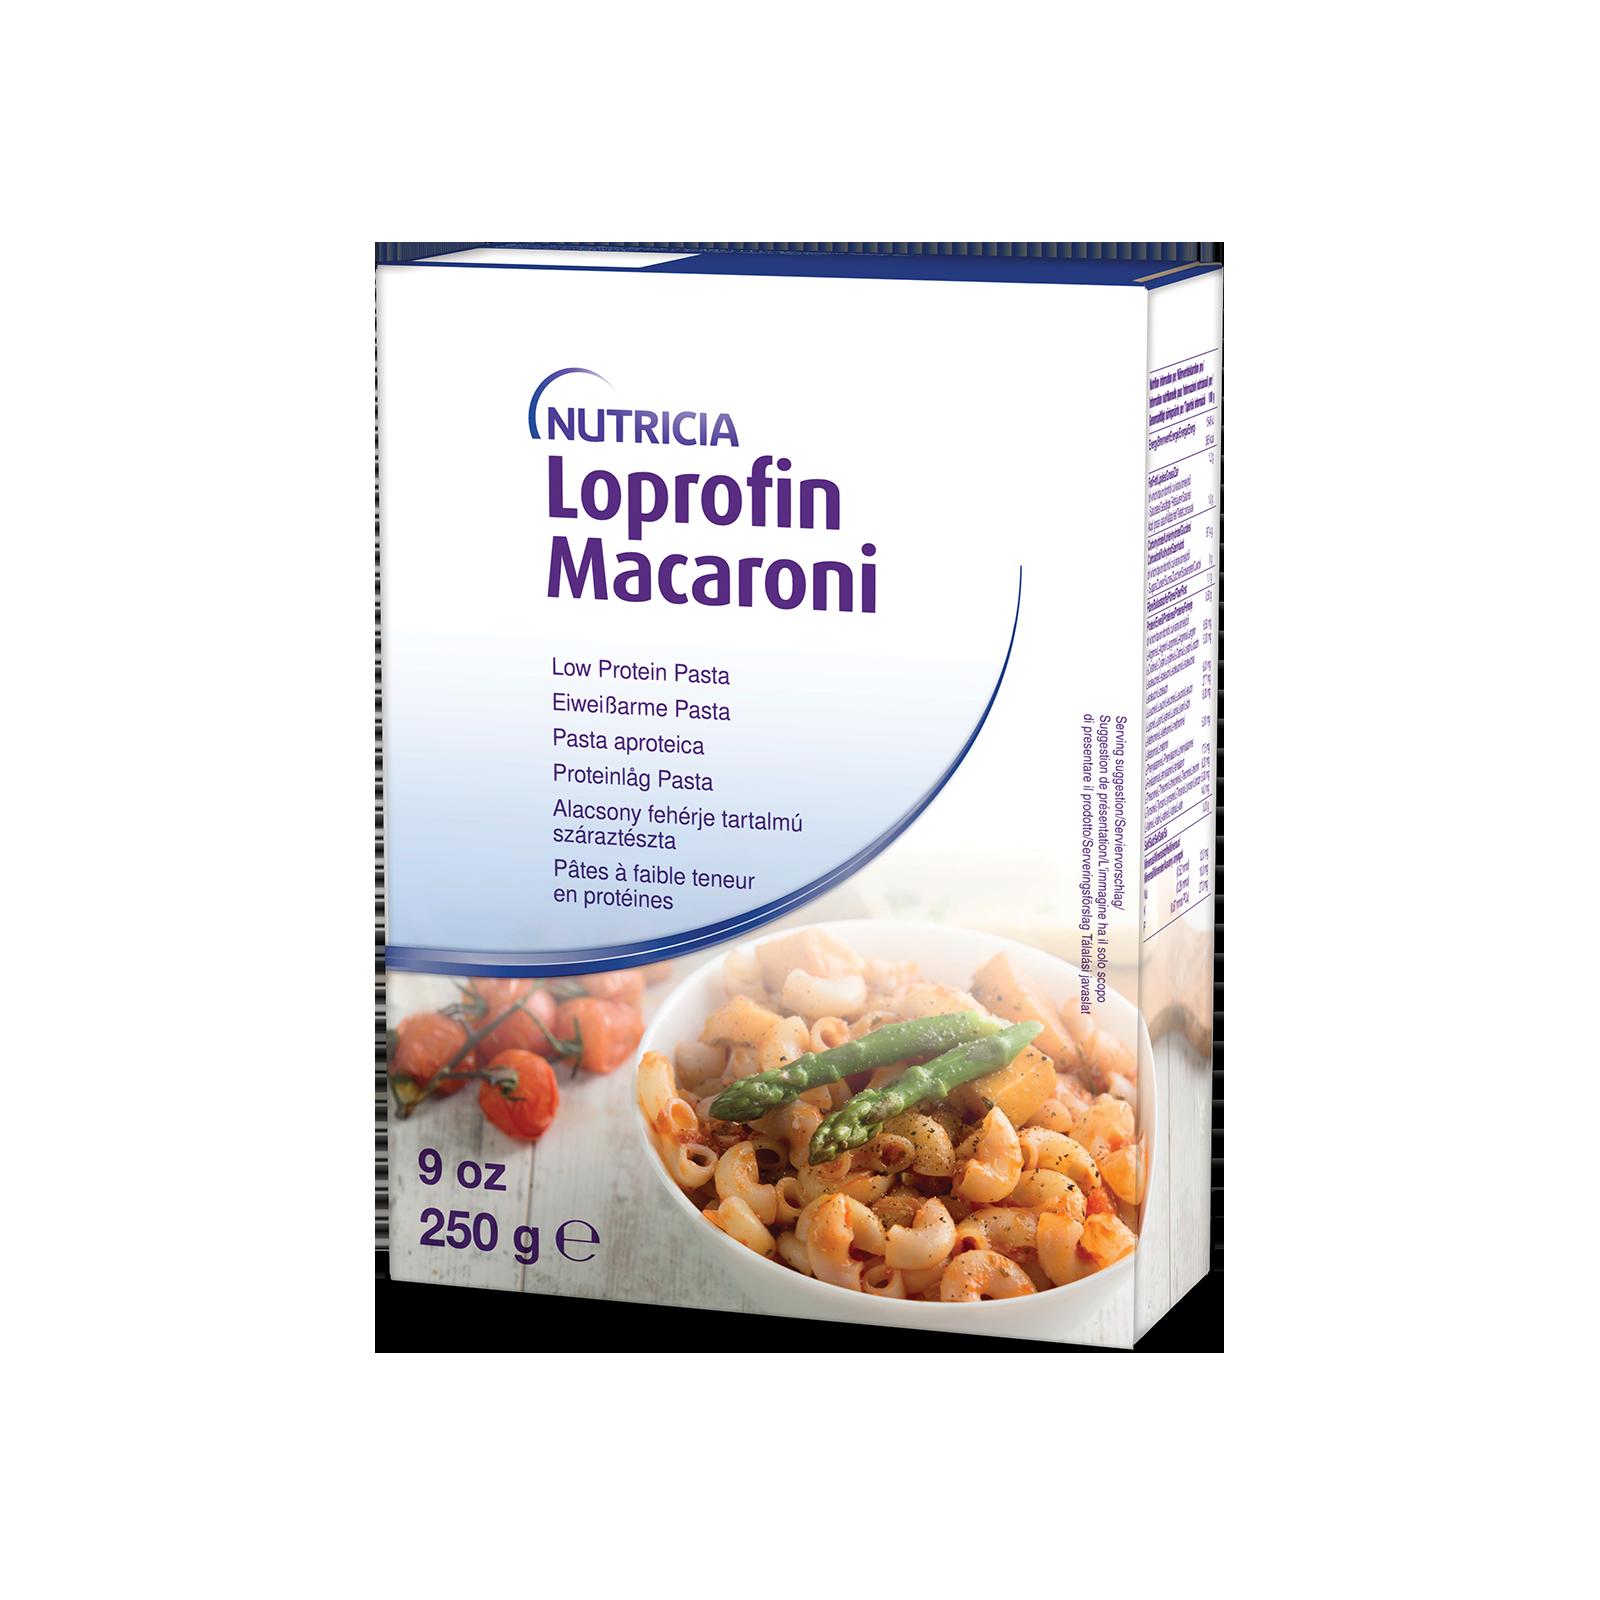 Loprofin Pasta Ave Storte scatola da 250g | Nutricia